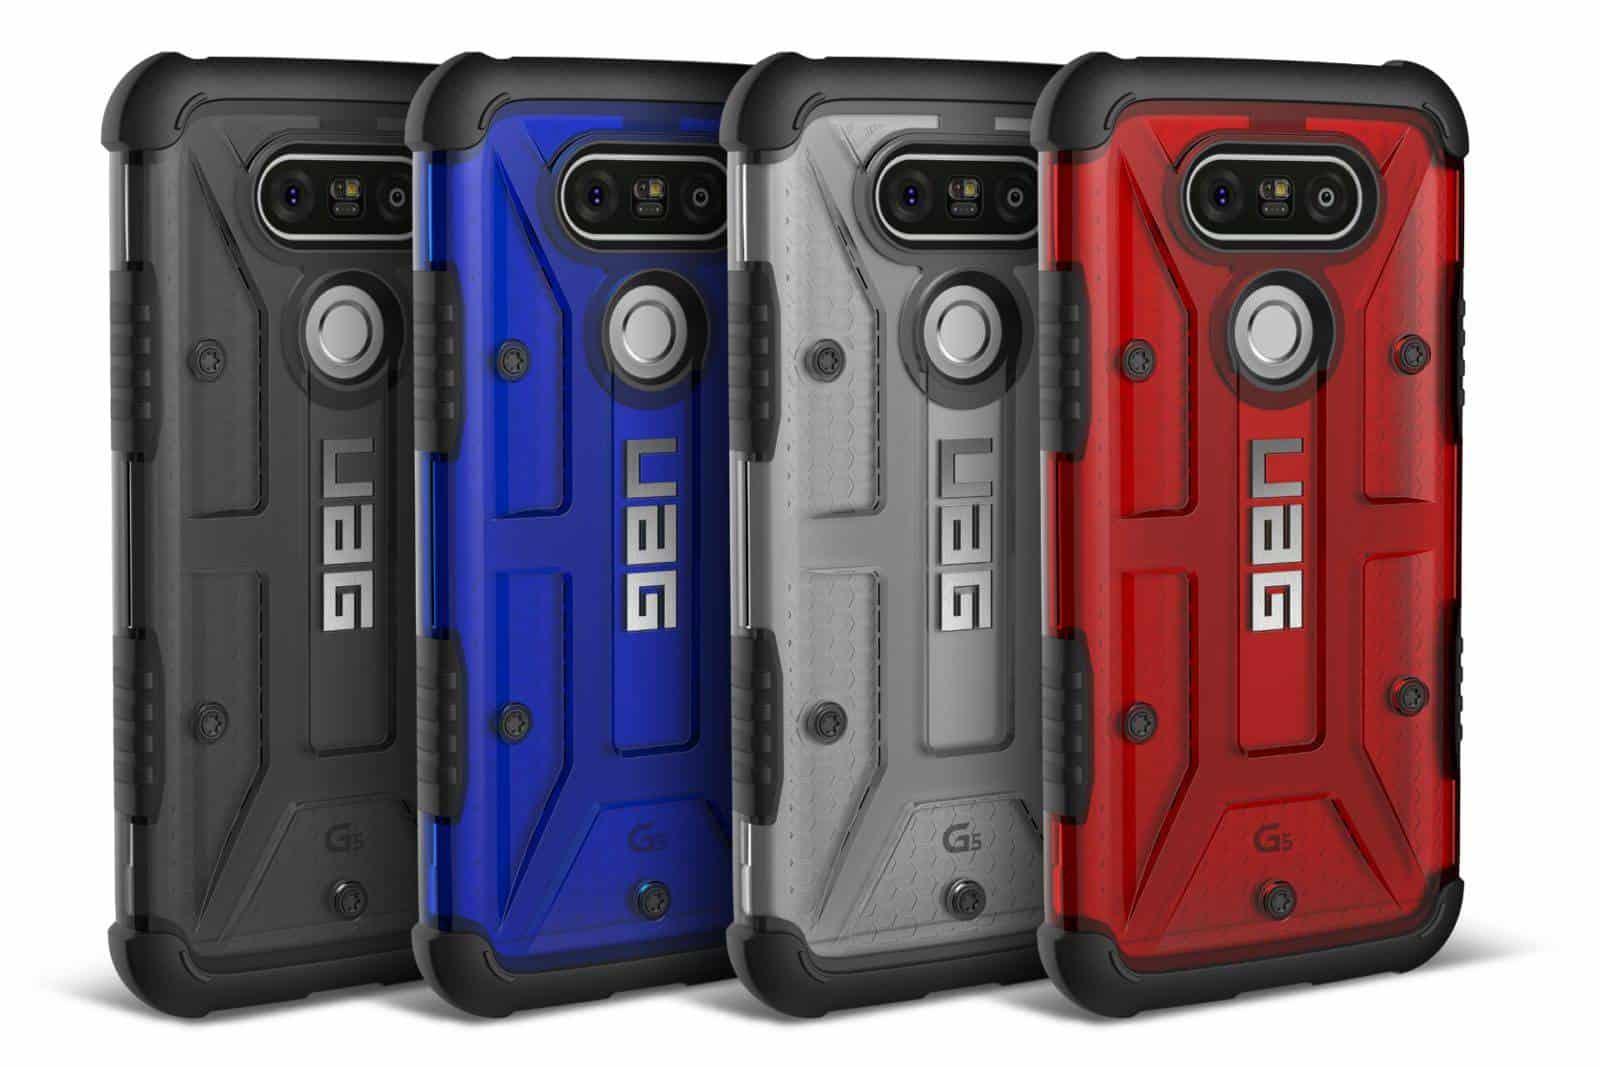 LG G5 Urban Armor cases_1